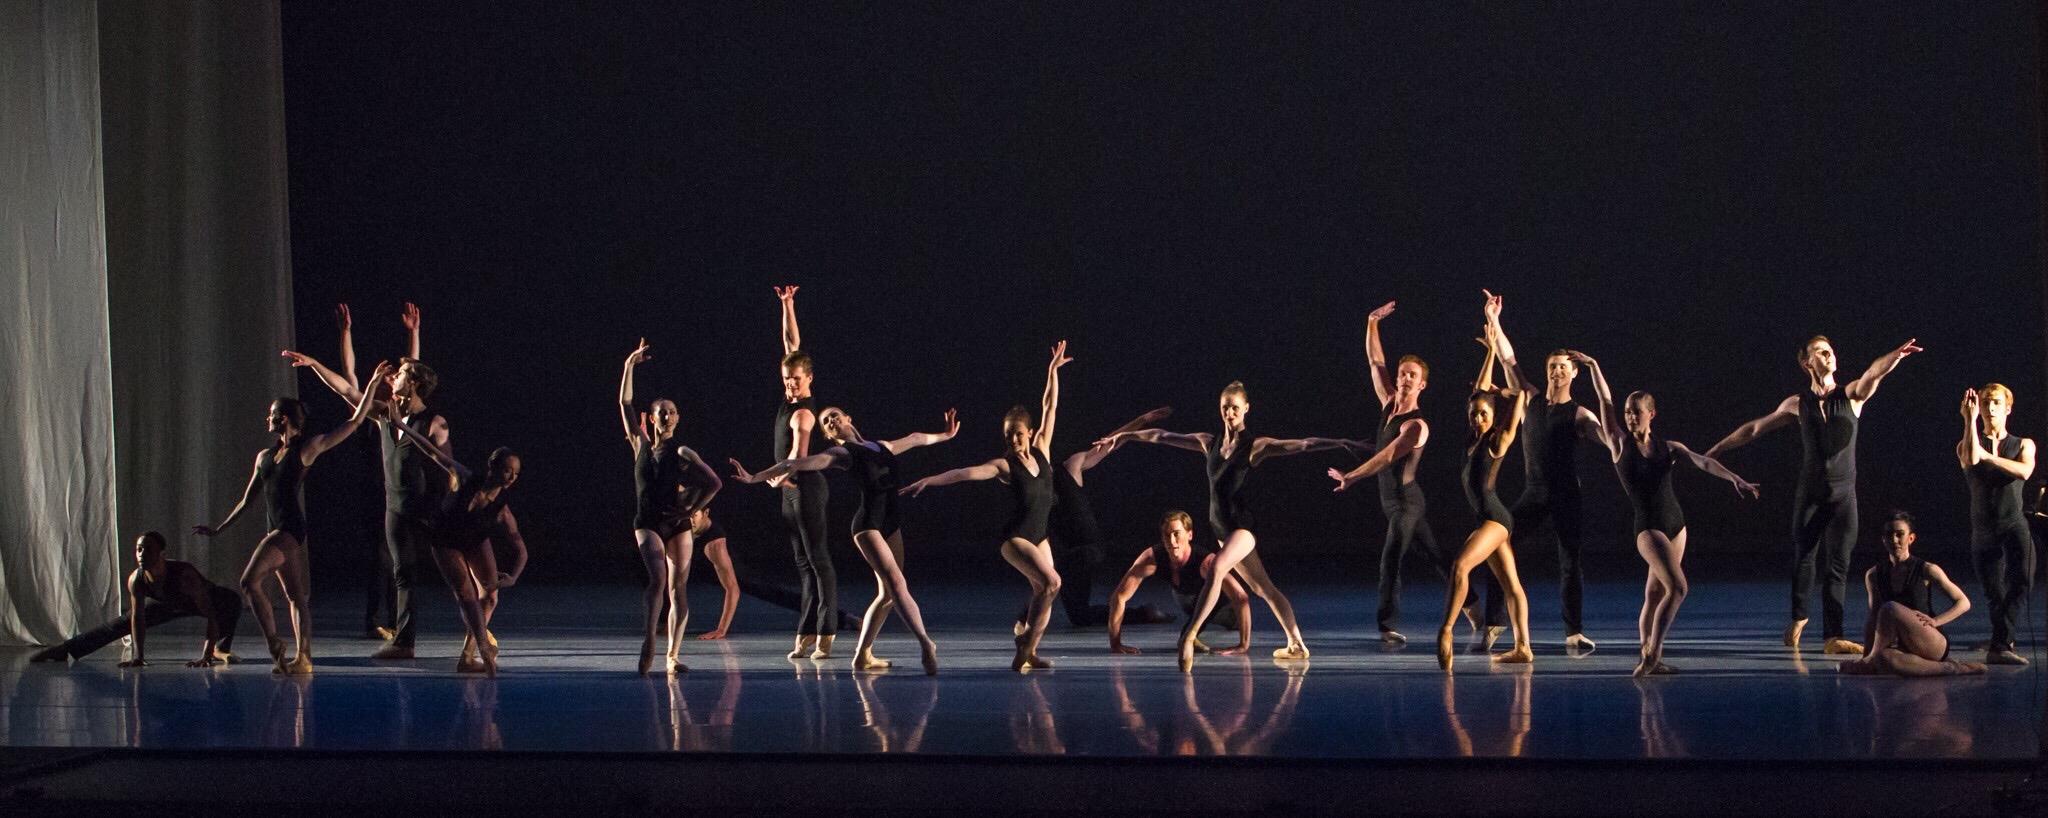 Nashville Ballet in Concerto